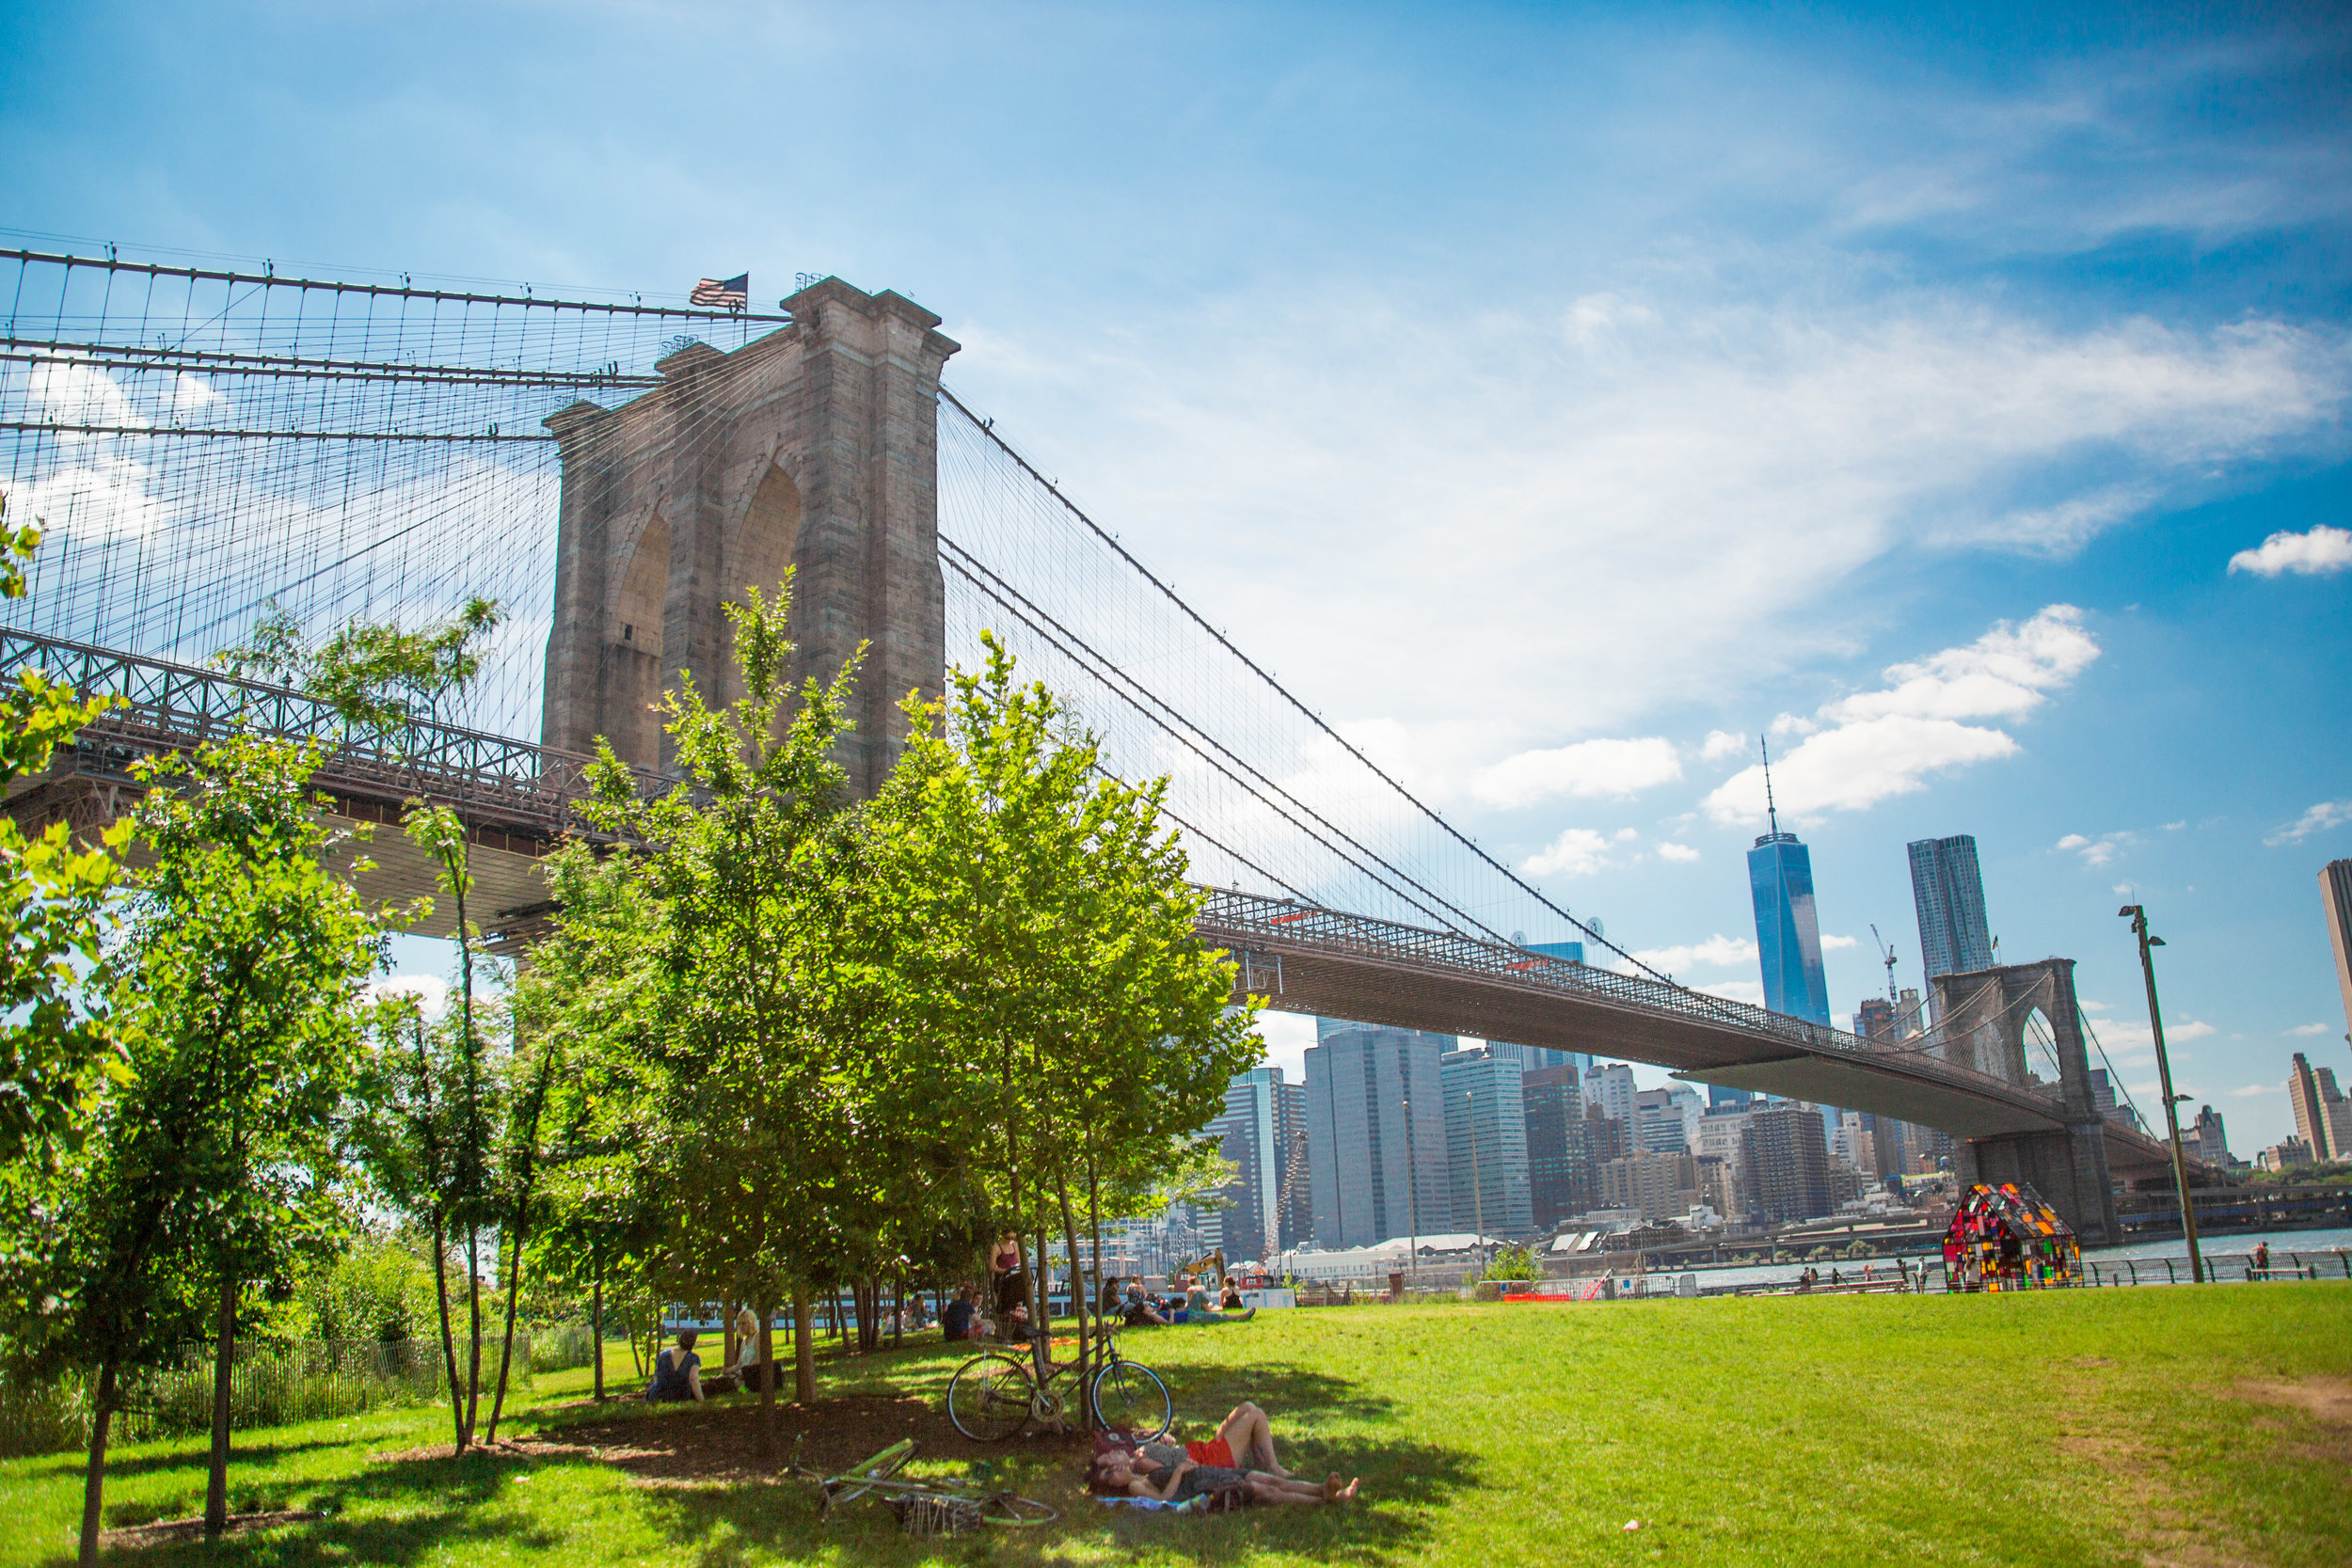 LSNY_Brooklyn_Bridge_Park-49.jpg